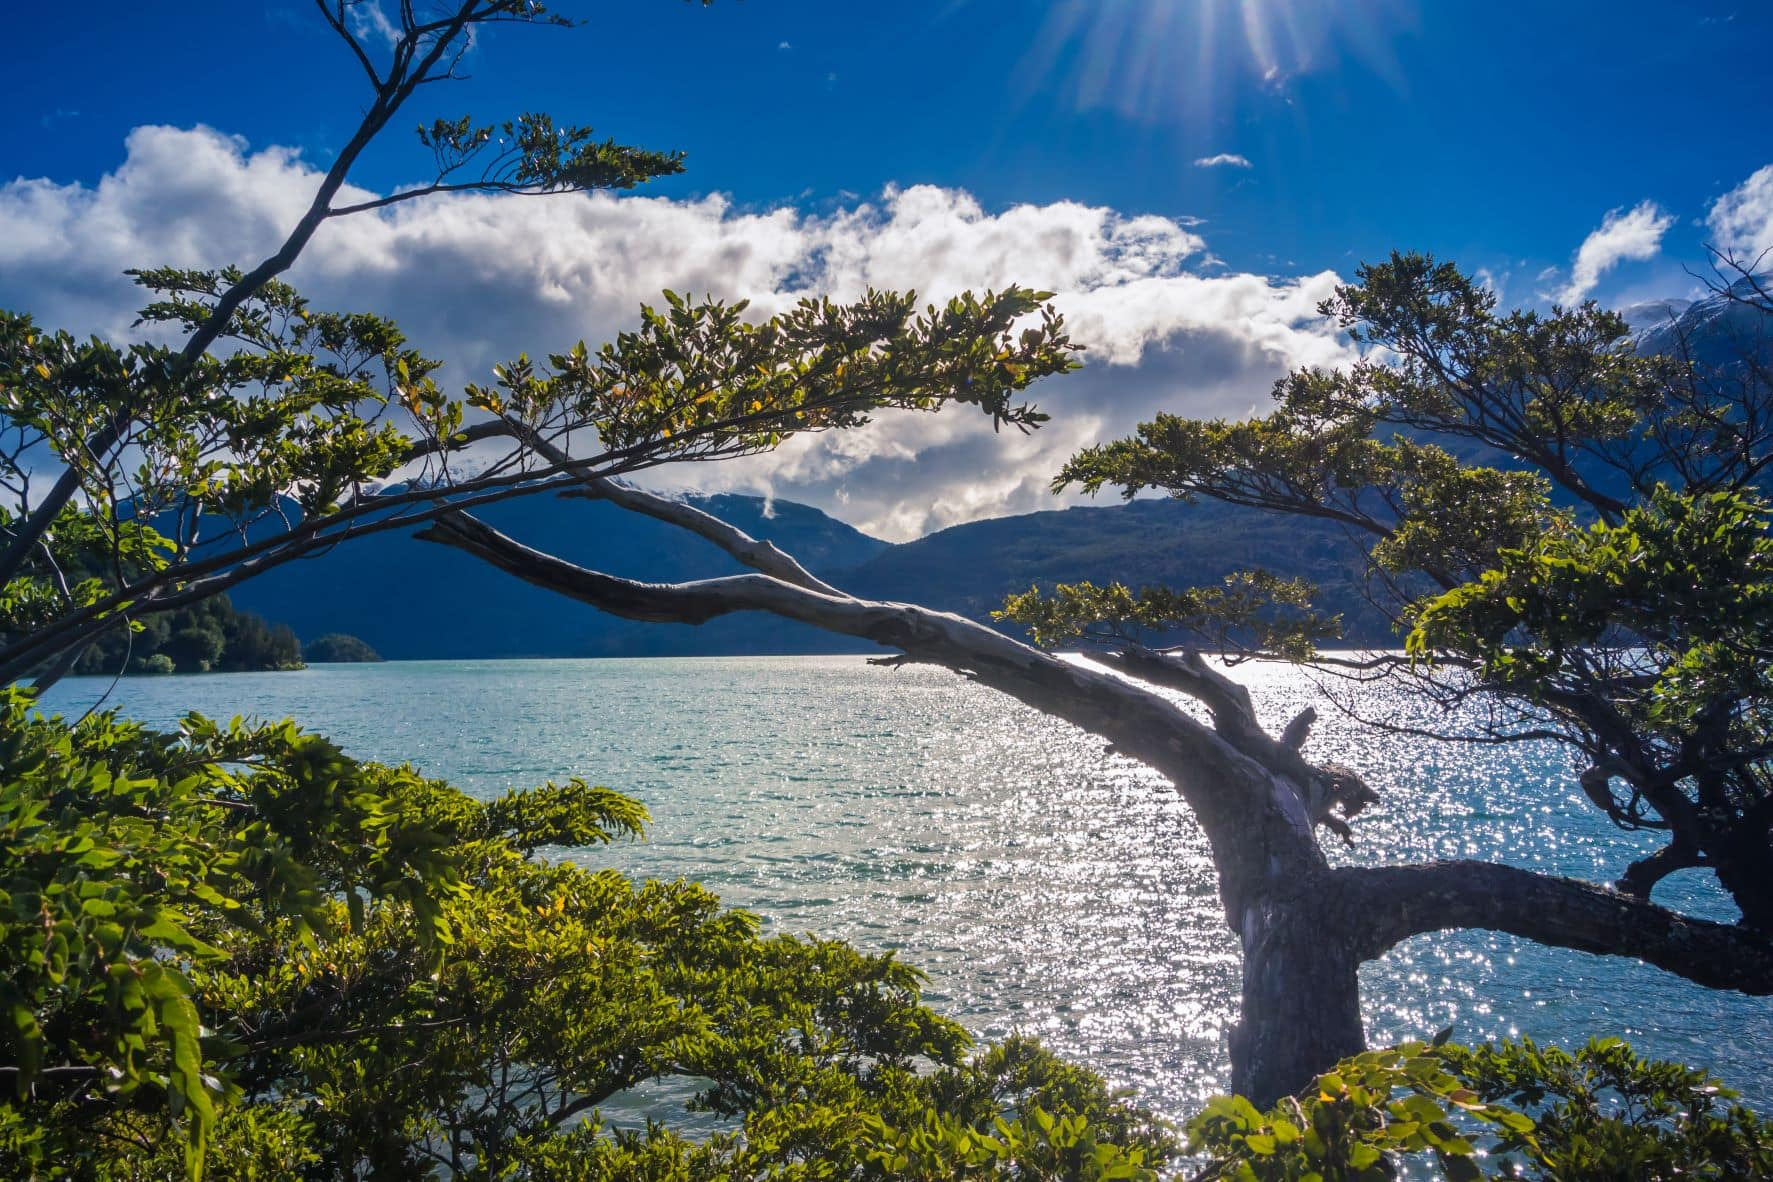 Los Alerces National Parque at Chubut Argentinien